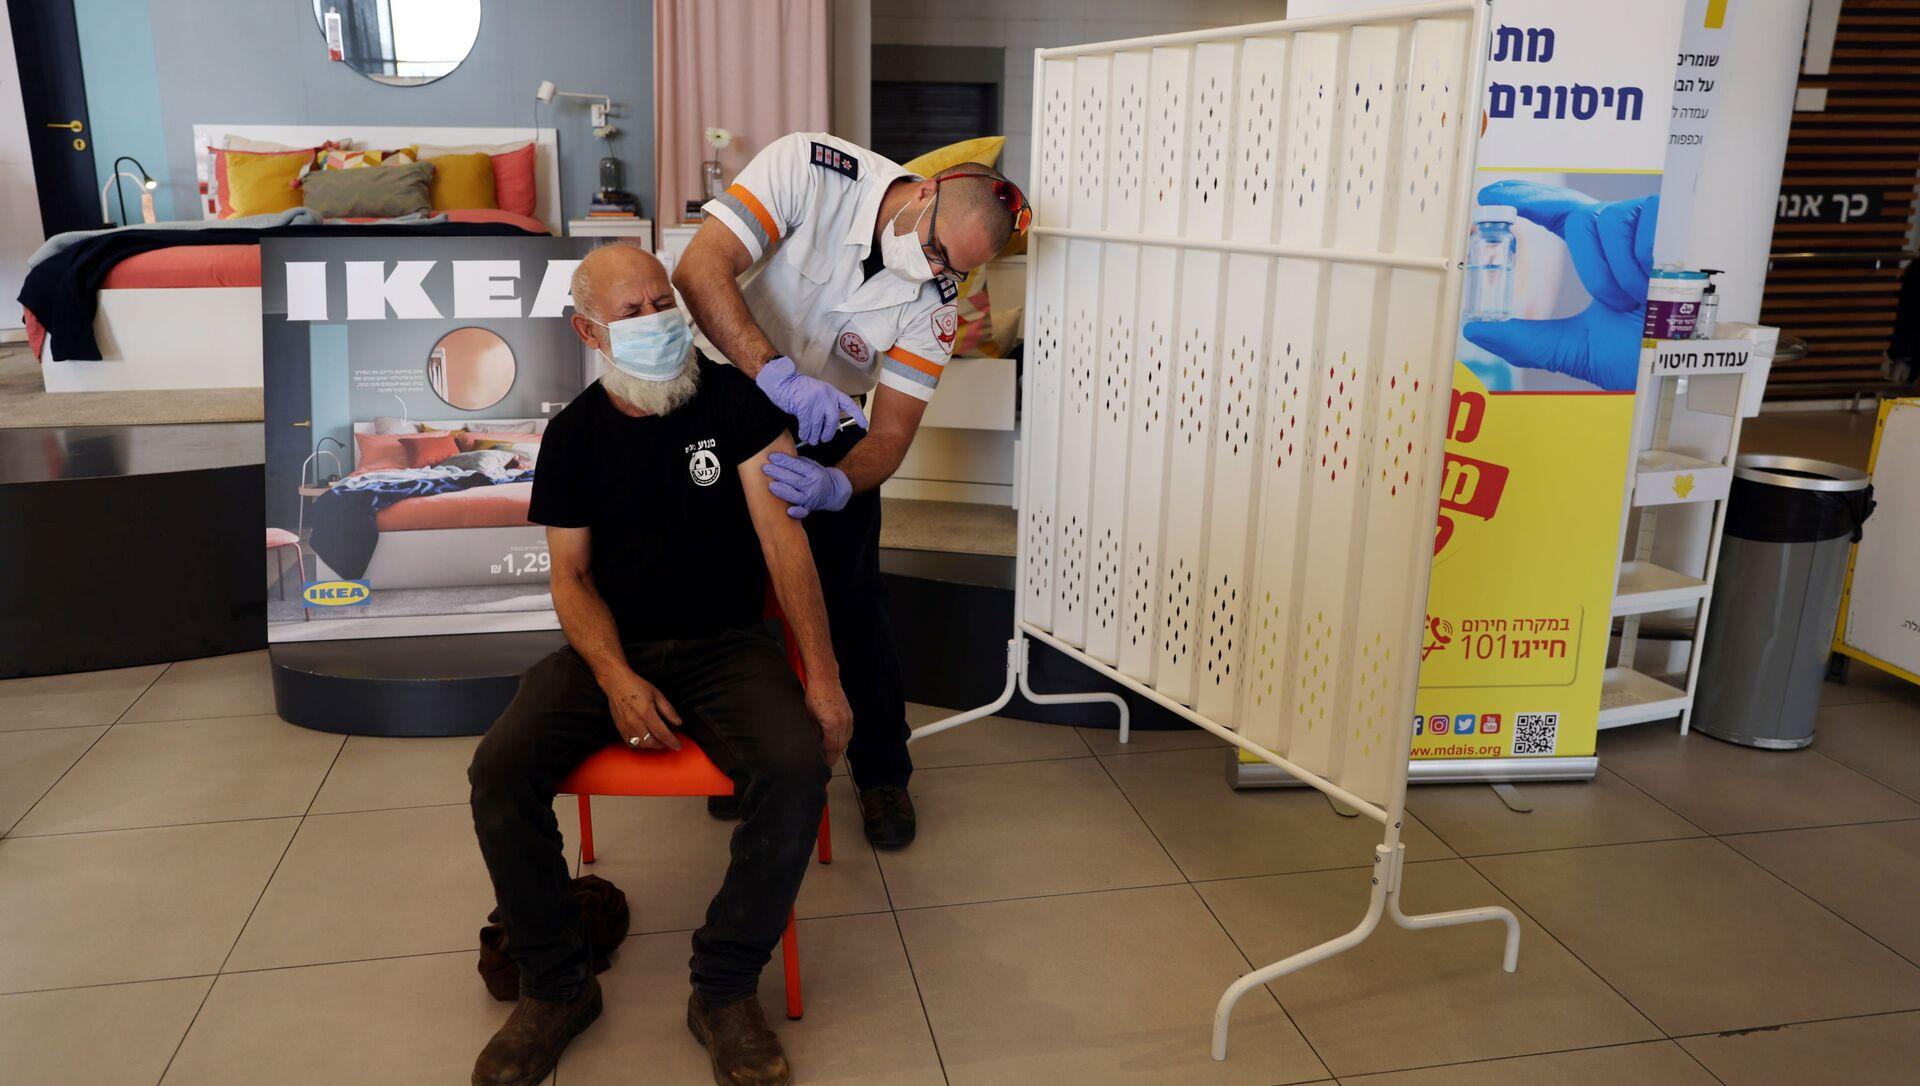 A man receives a vaccination against the coronavirus disease (COVID-19) in an IKEA store in Rishon Lezion, Israel February 22, 2021.  - Sputnik International, 1920, 26.08.2021